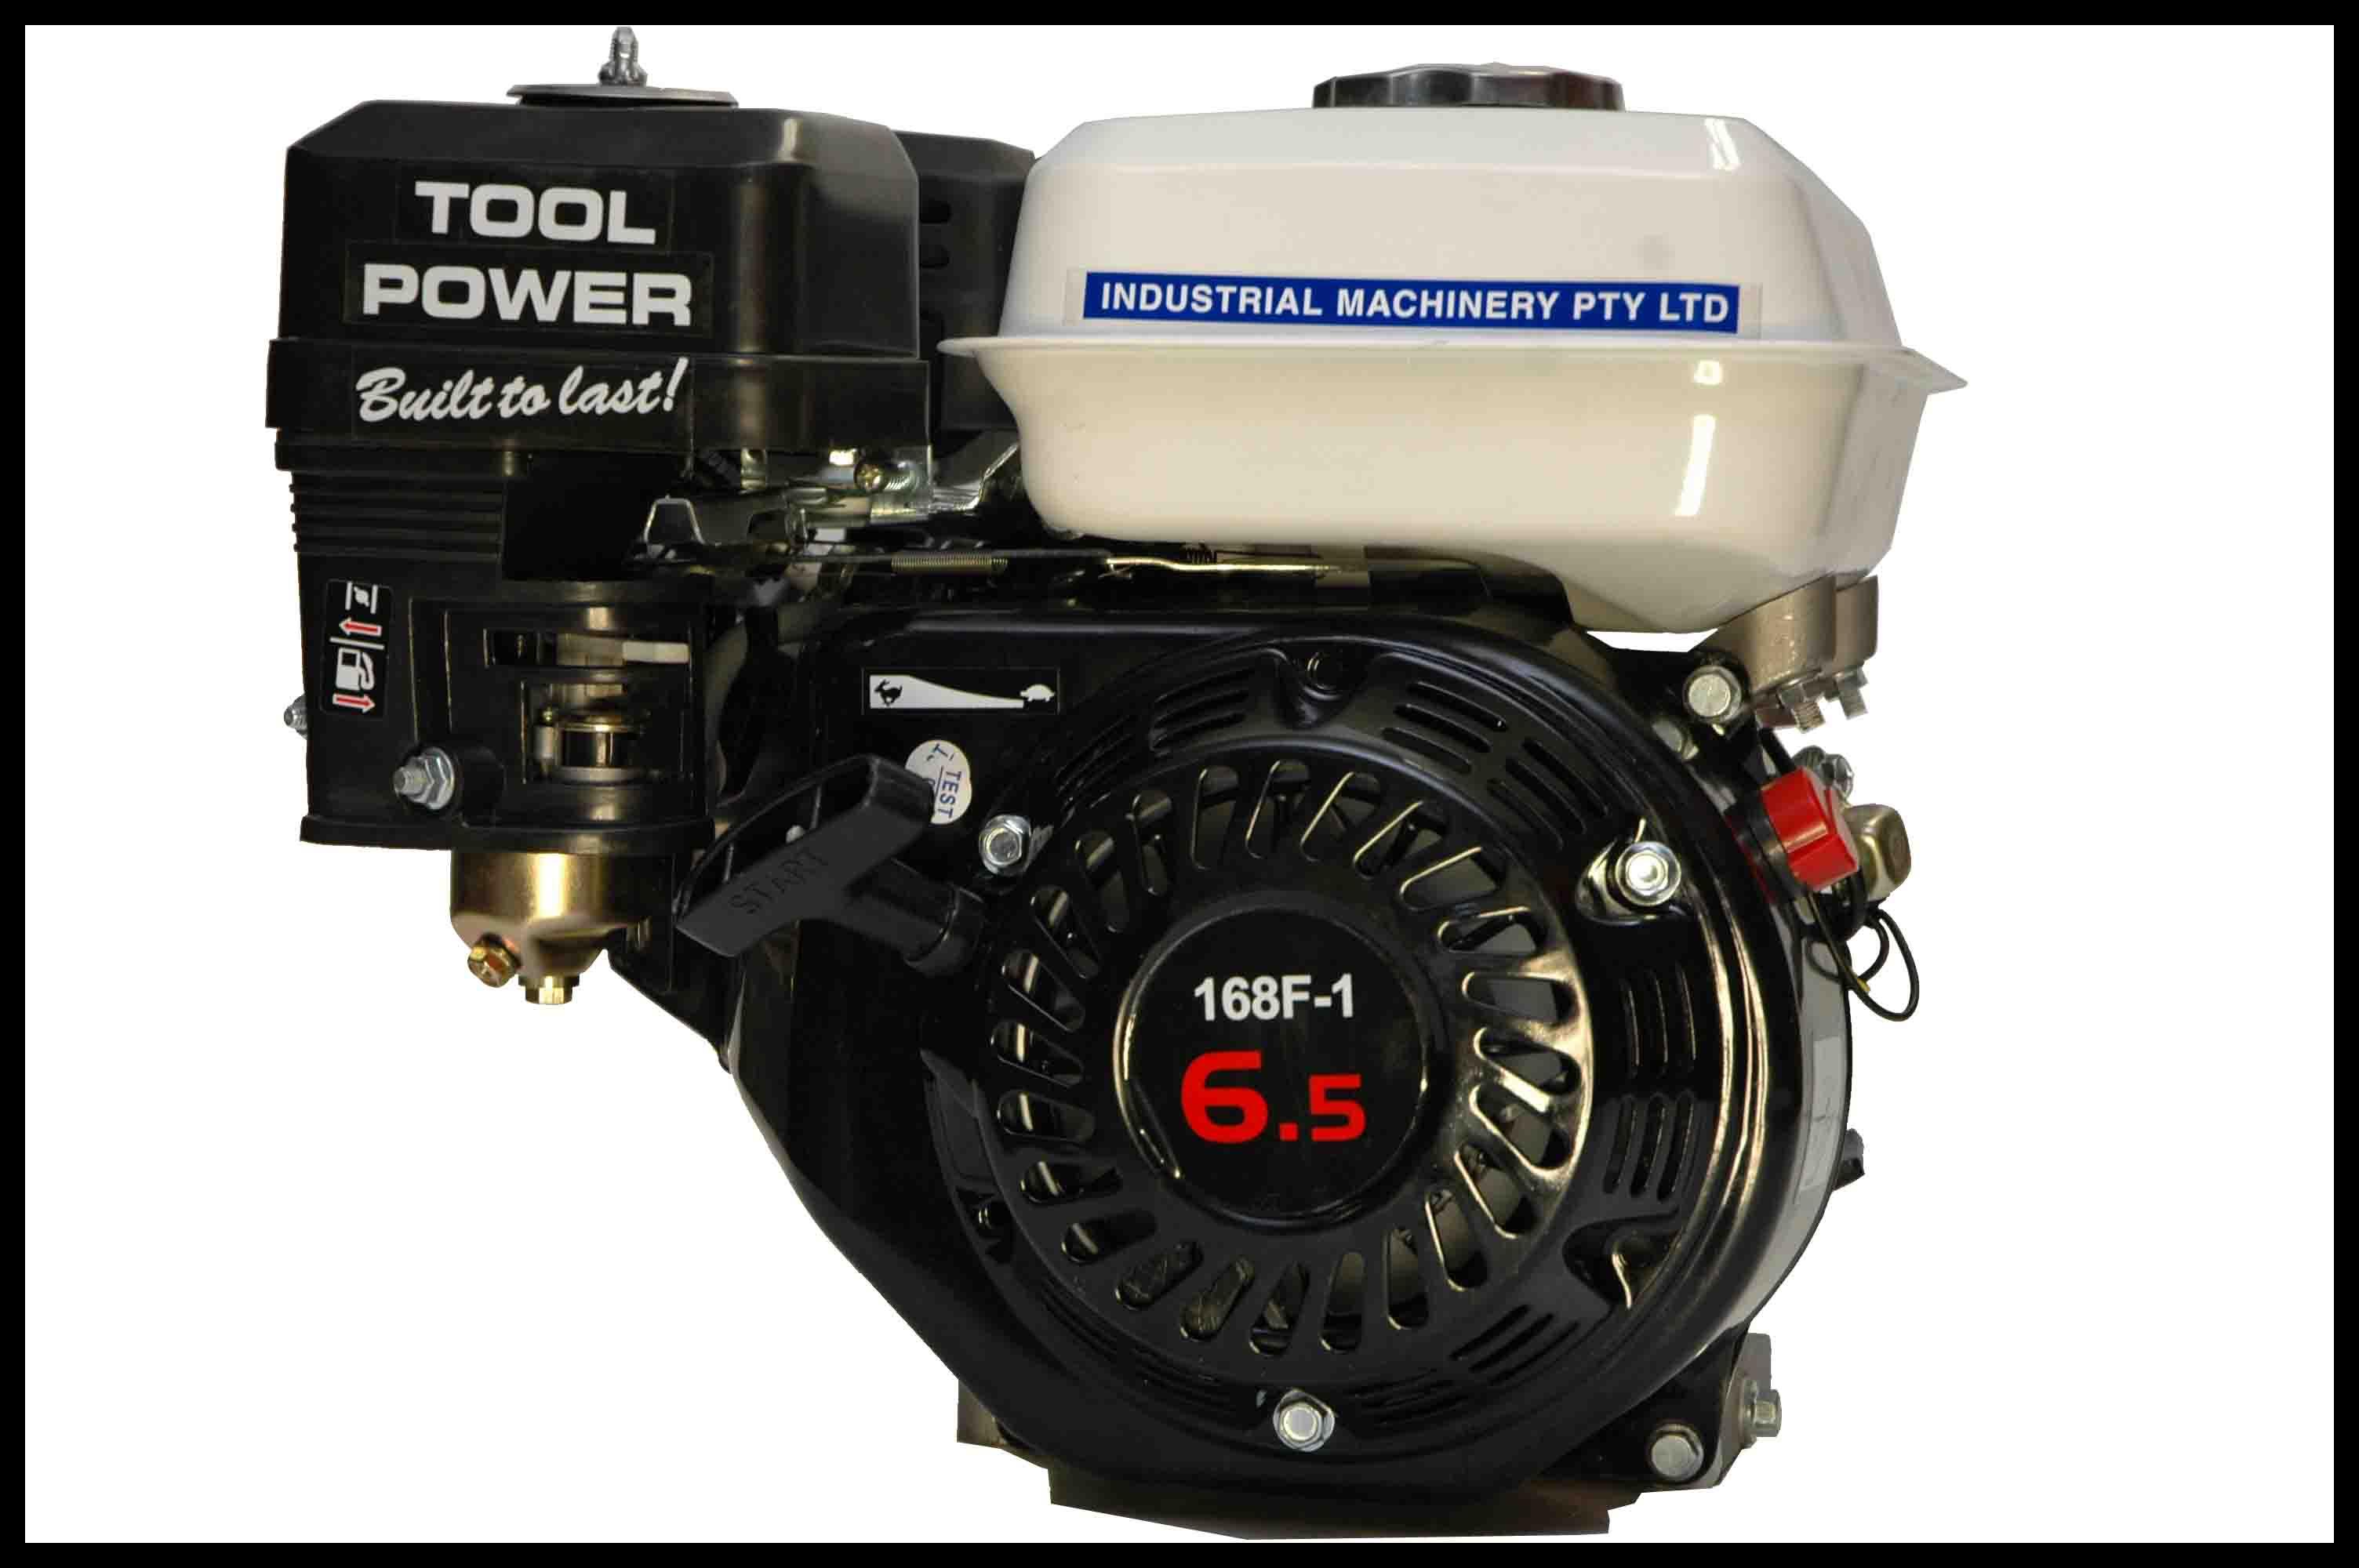 Engine 6.5-hp TOOL POWER 19mm straight shaft*******-1669